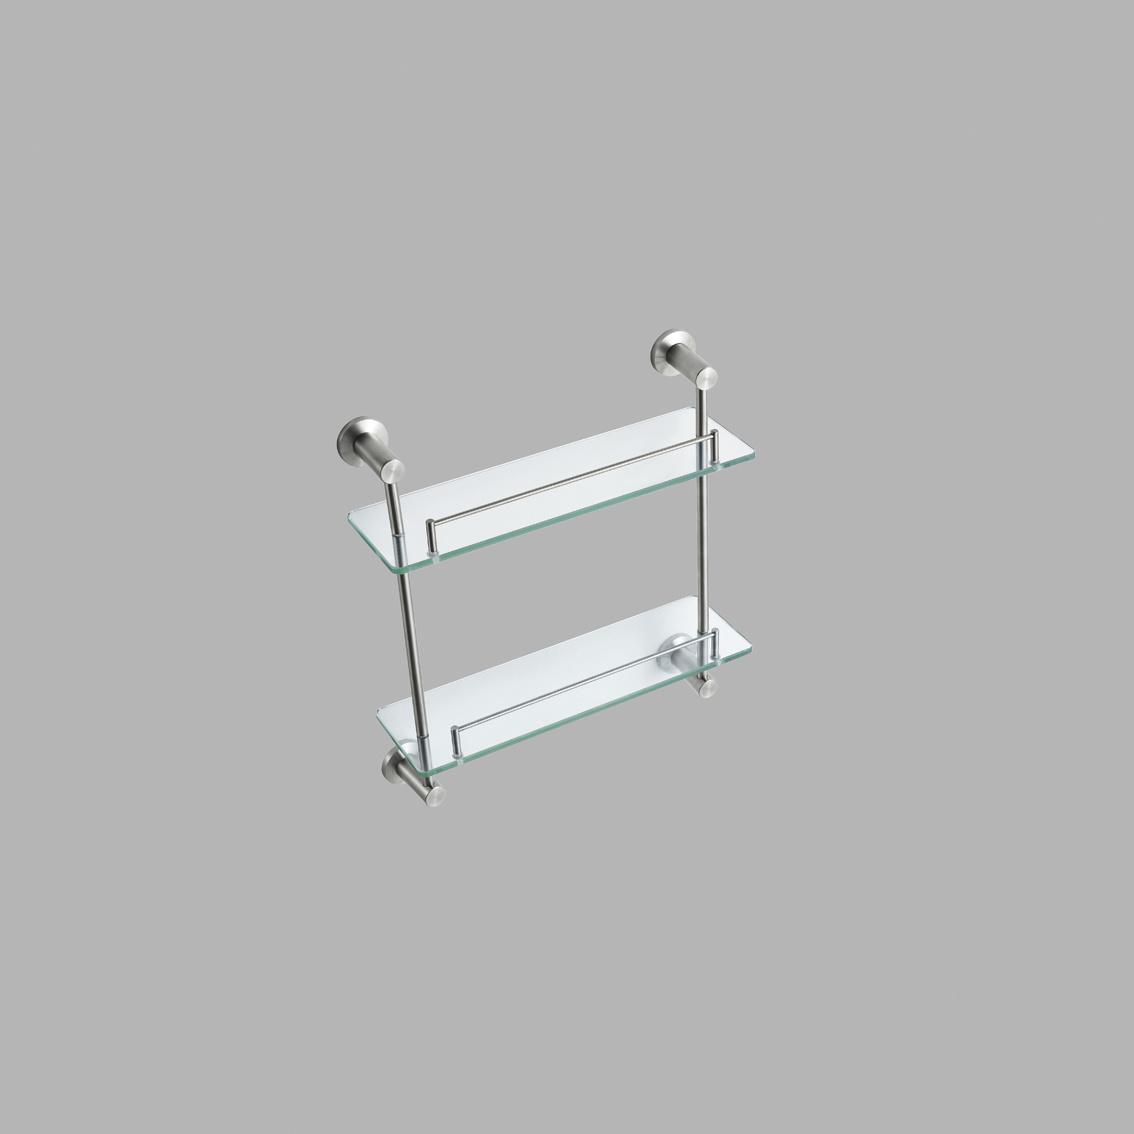 china bathroom double glass shelf 70702 china bathroom. Black Bedroom Furniture Sets. Home Design Ideas